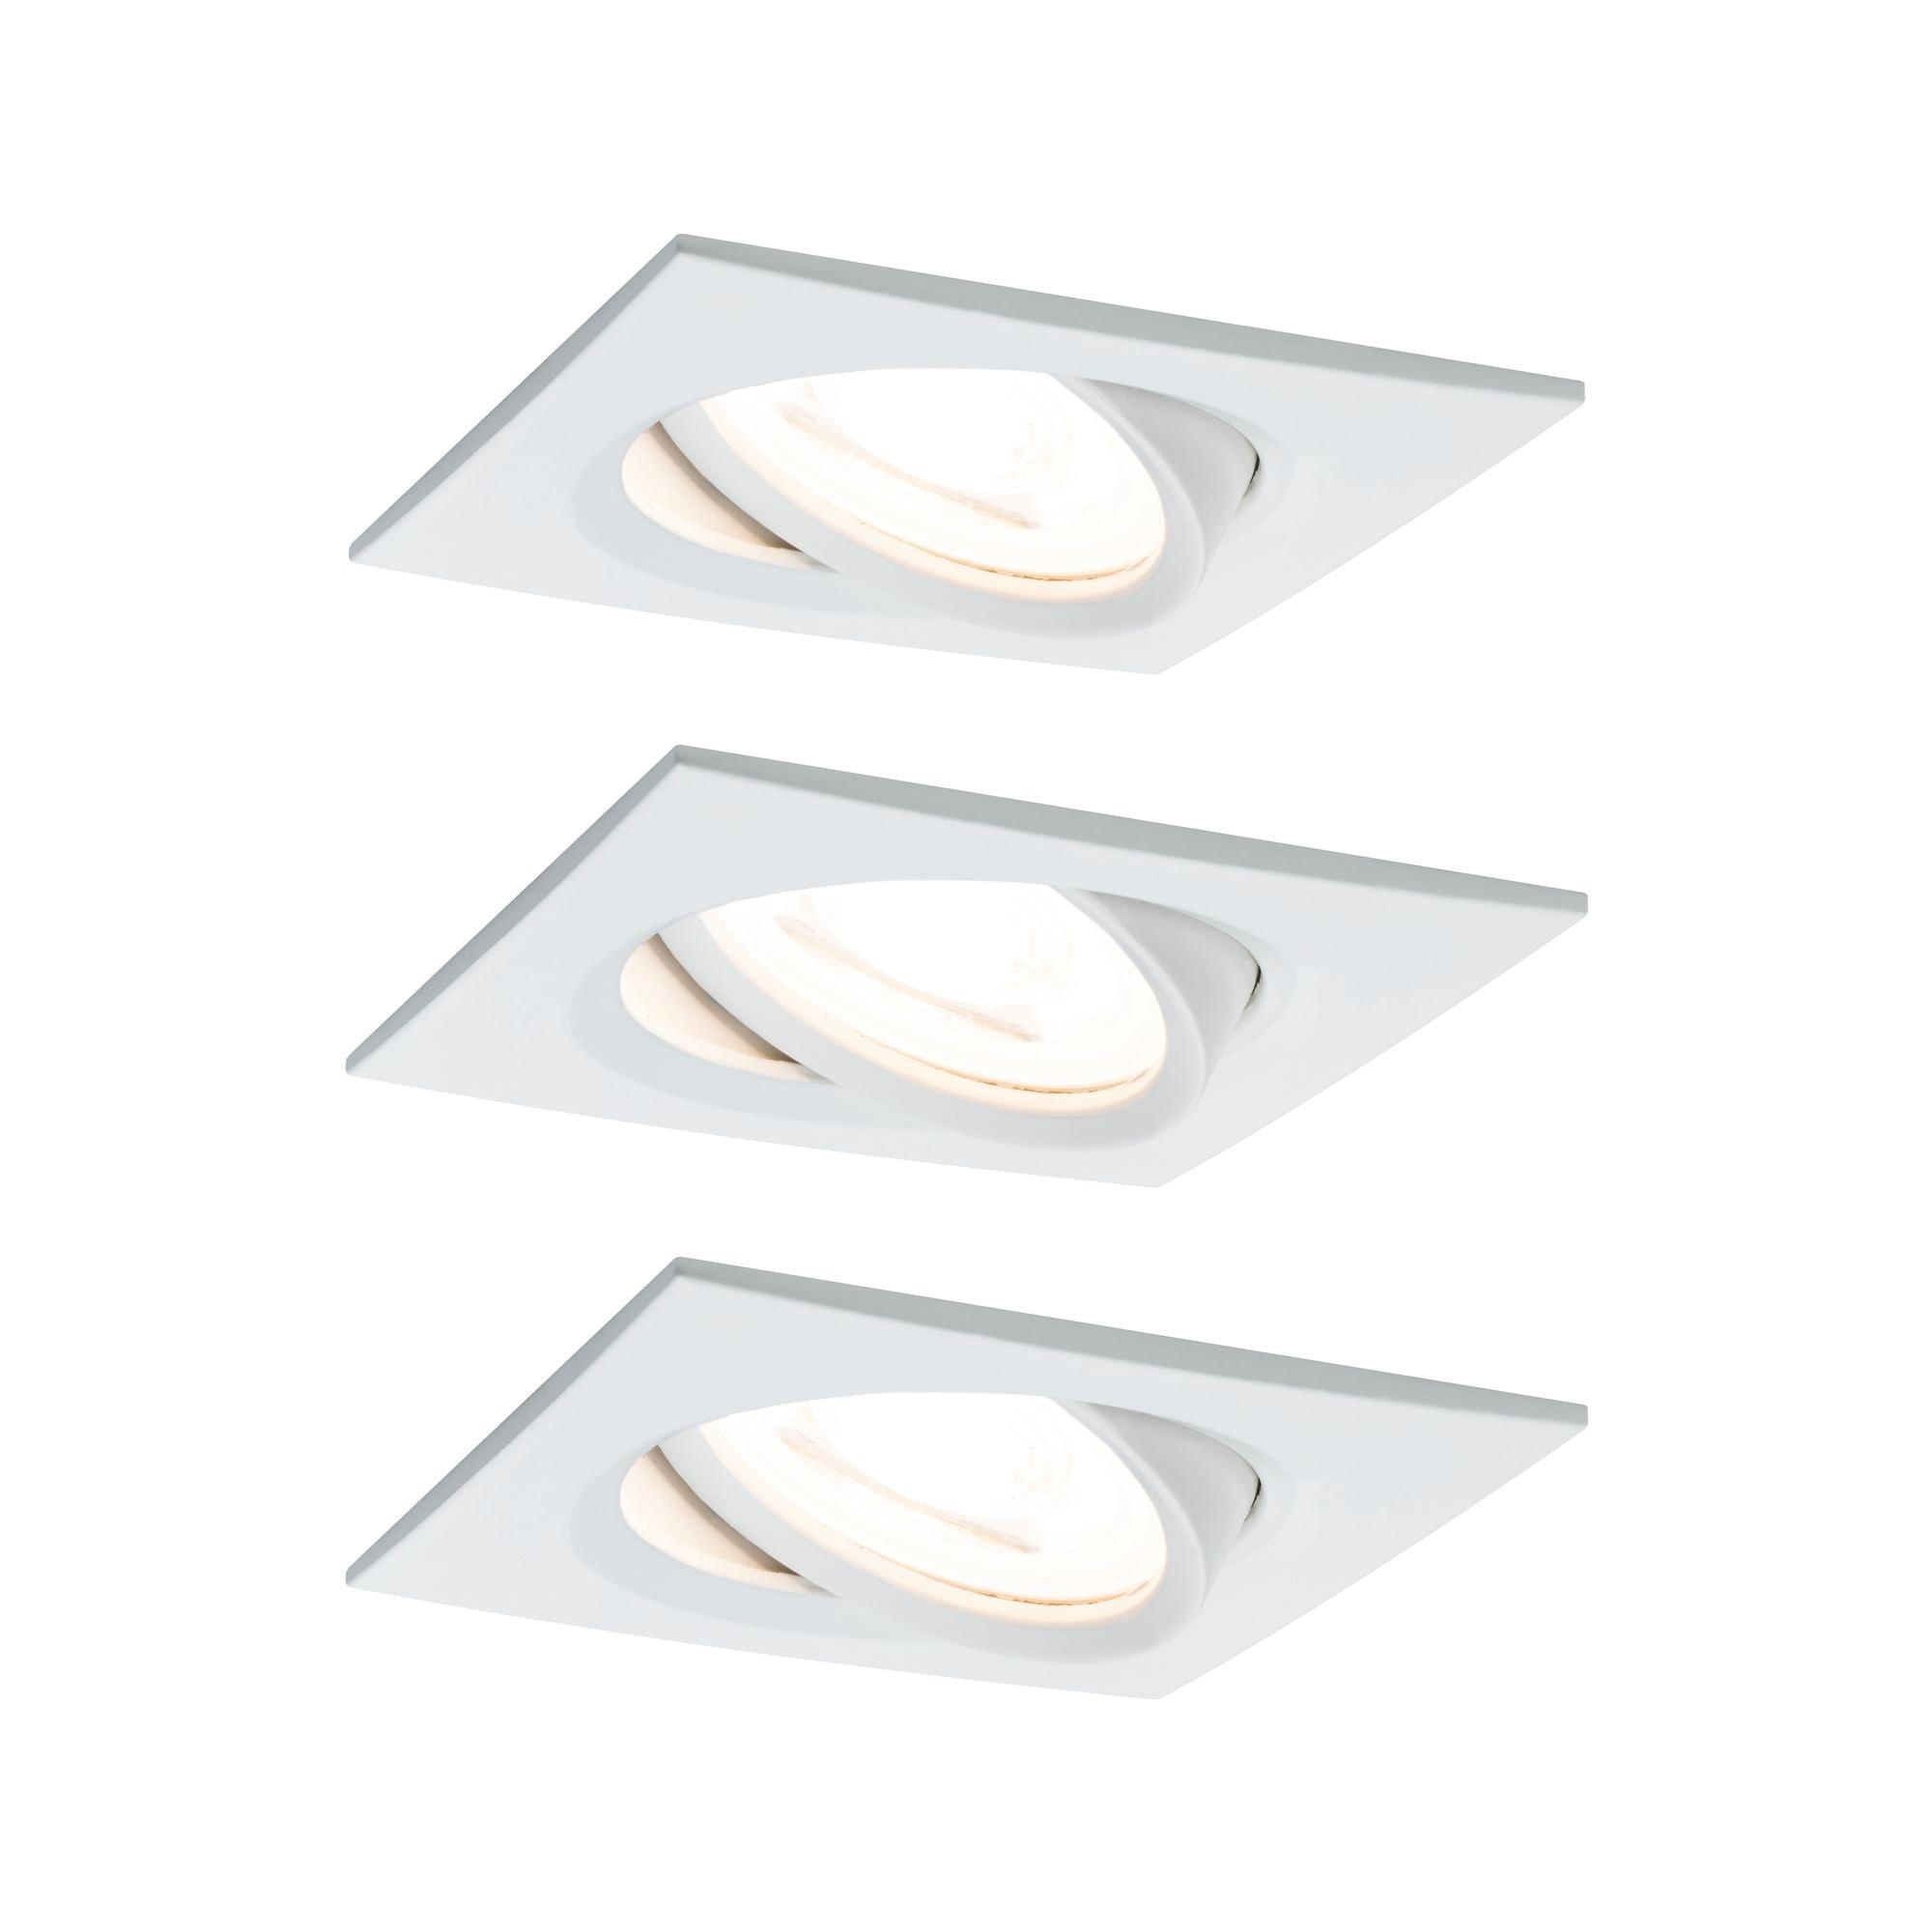 Paulmann LED Einbaustrahler Nova eckig 3x6,5W Weiß matt schwenkbar, Warmweiß